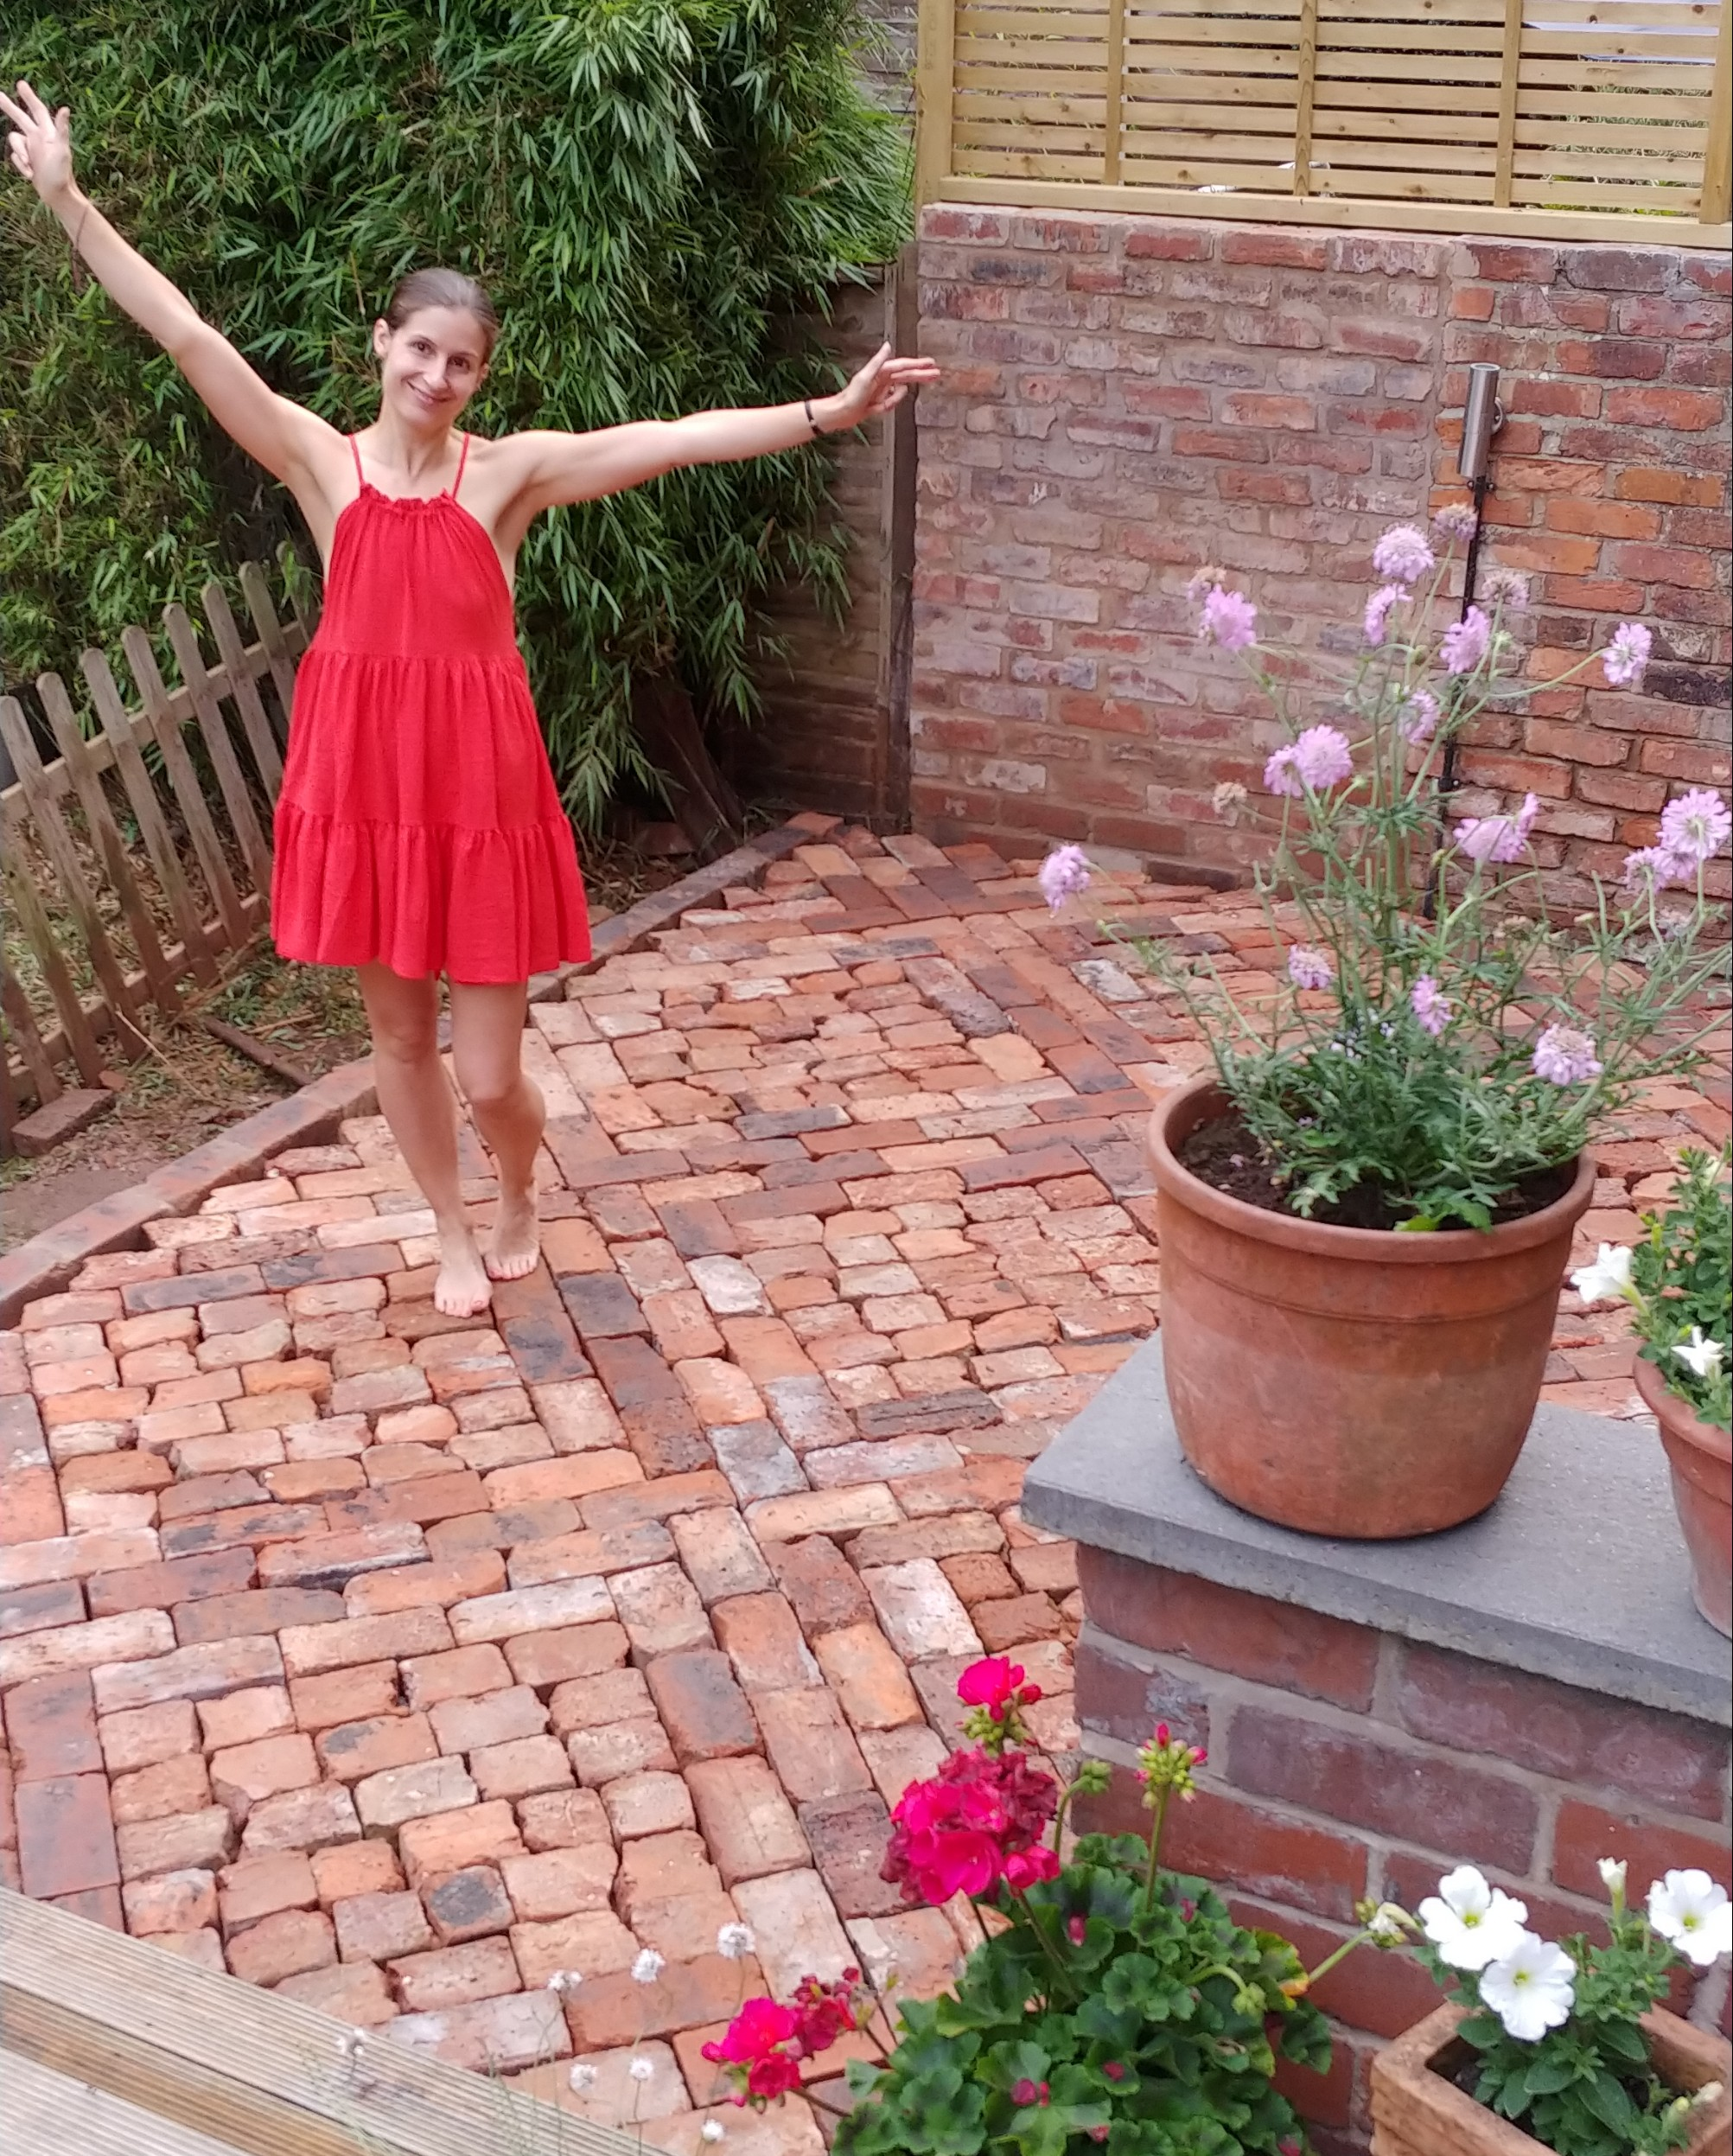 Lay A Patio From Reclaimed Bricks